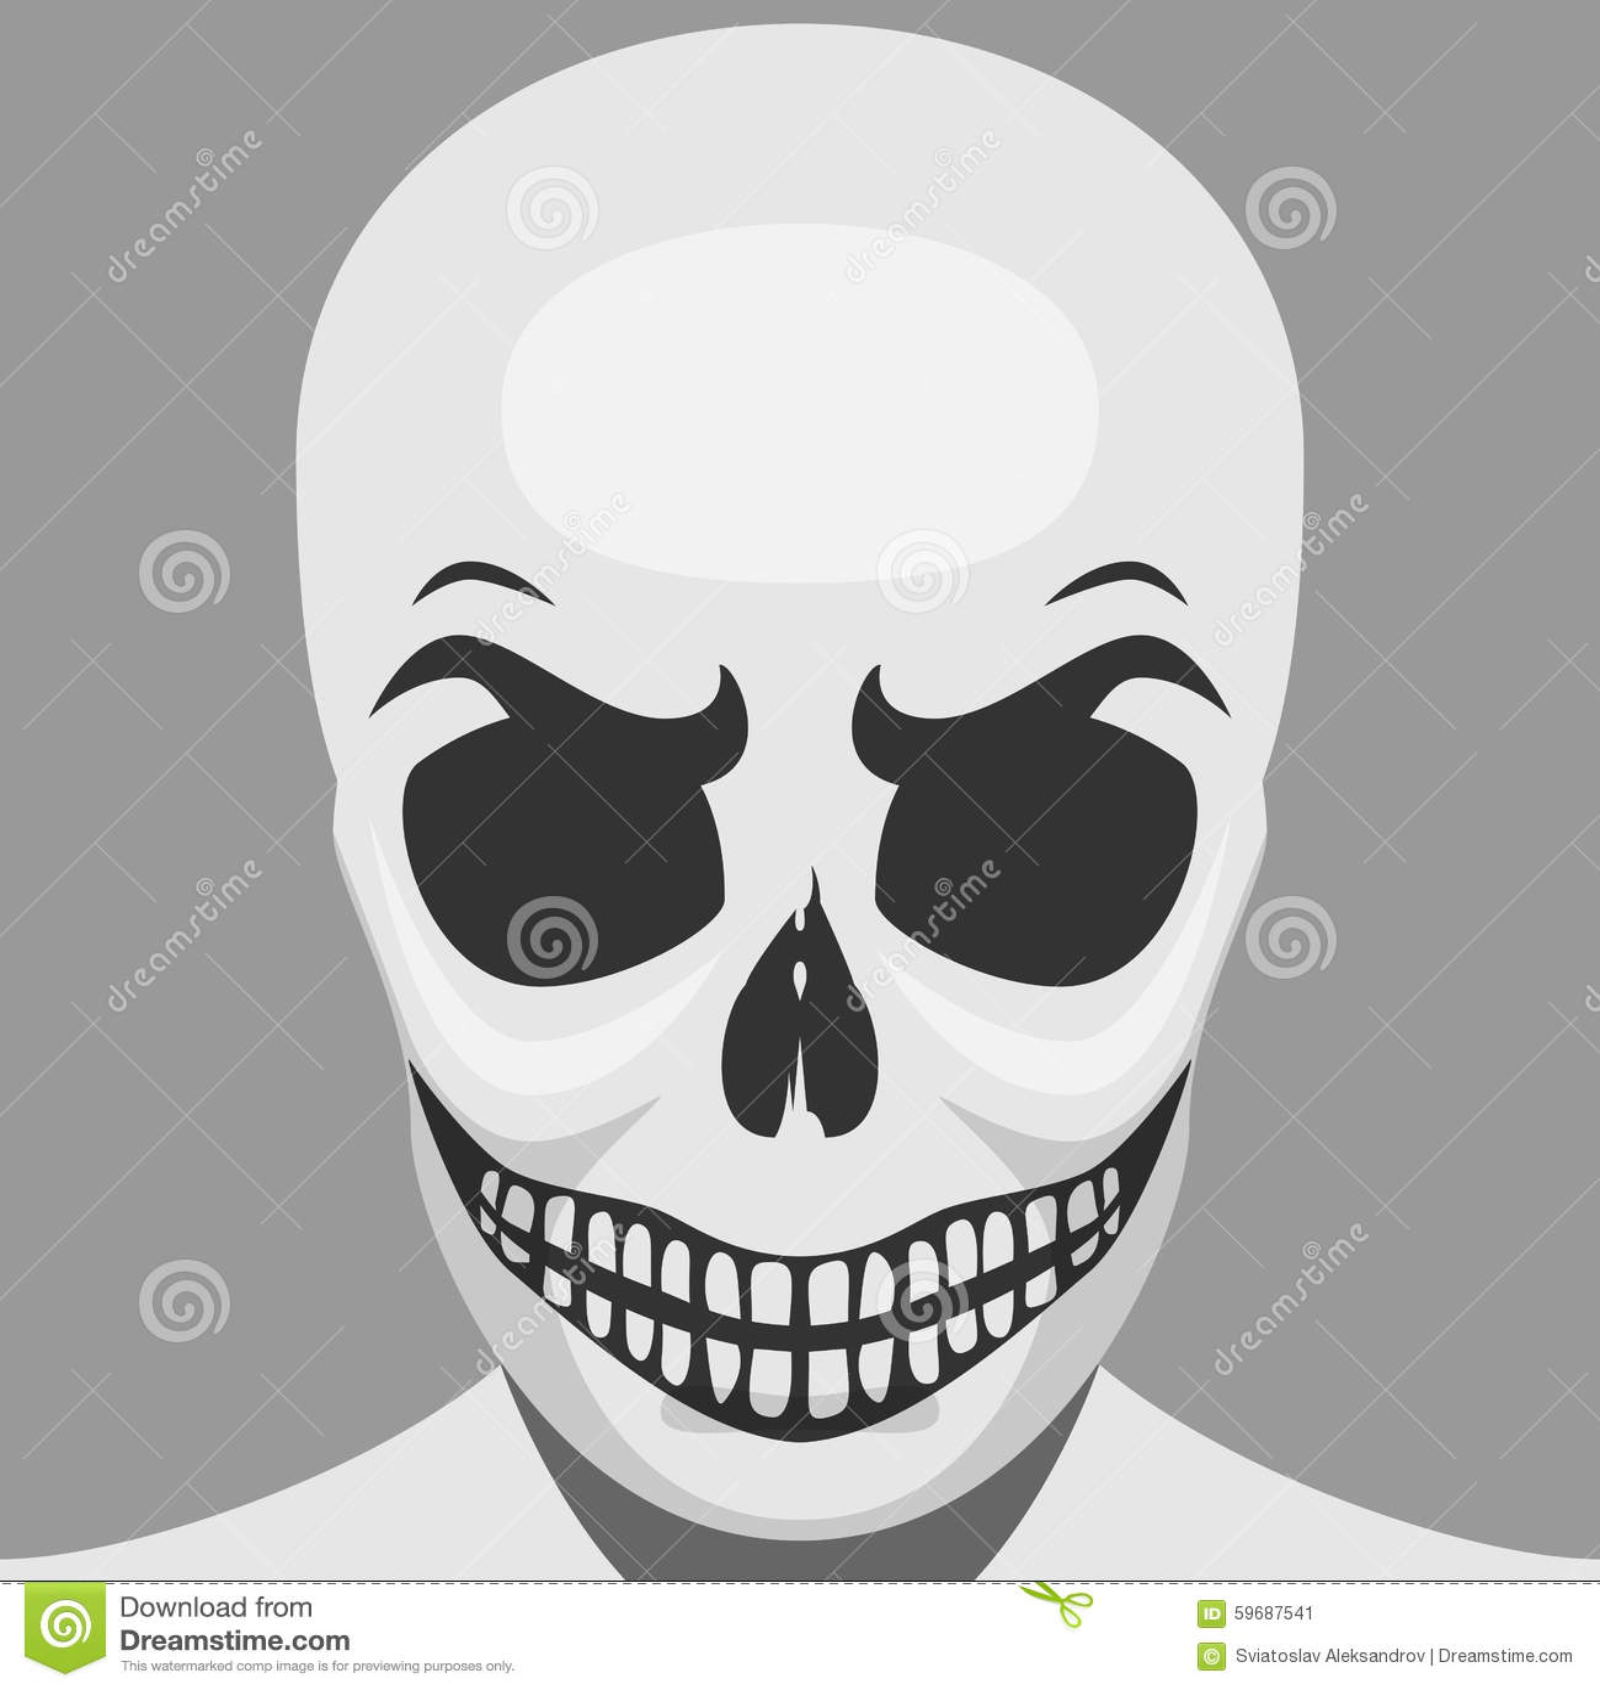 Uncategorized Scary Halloween Skulls photo collection scary halloween spooky skull skulls 001 motion background videoblocks